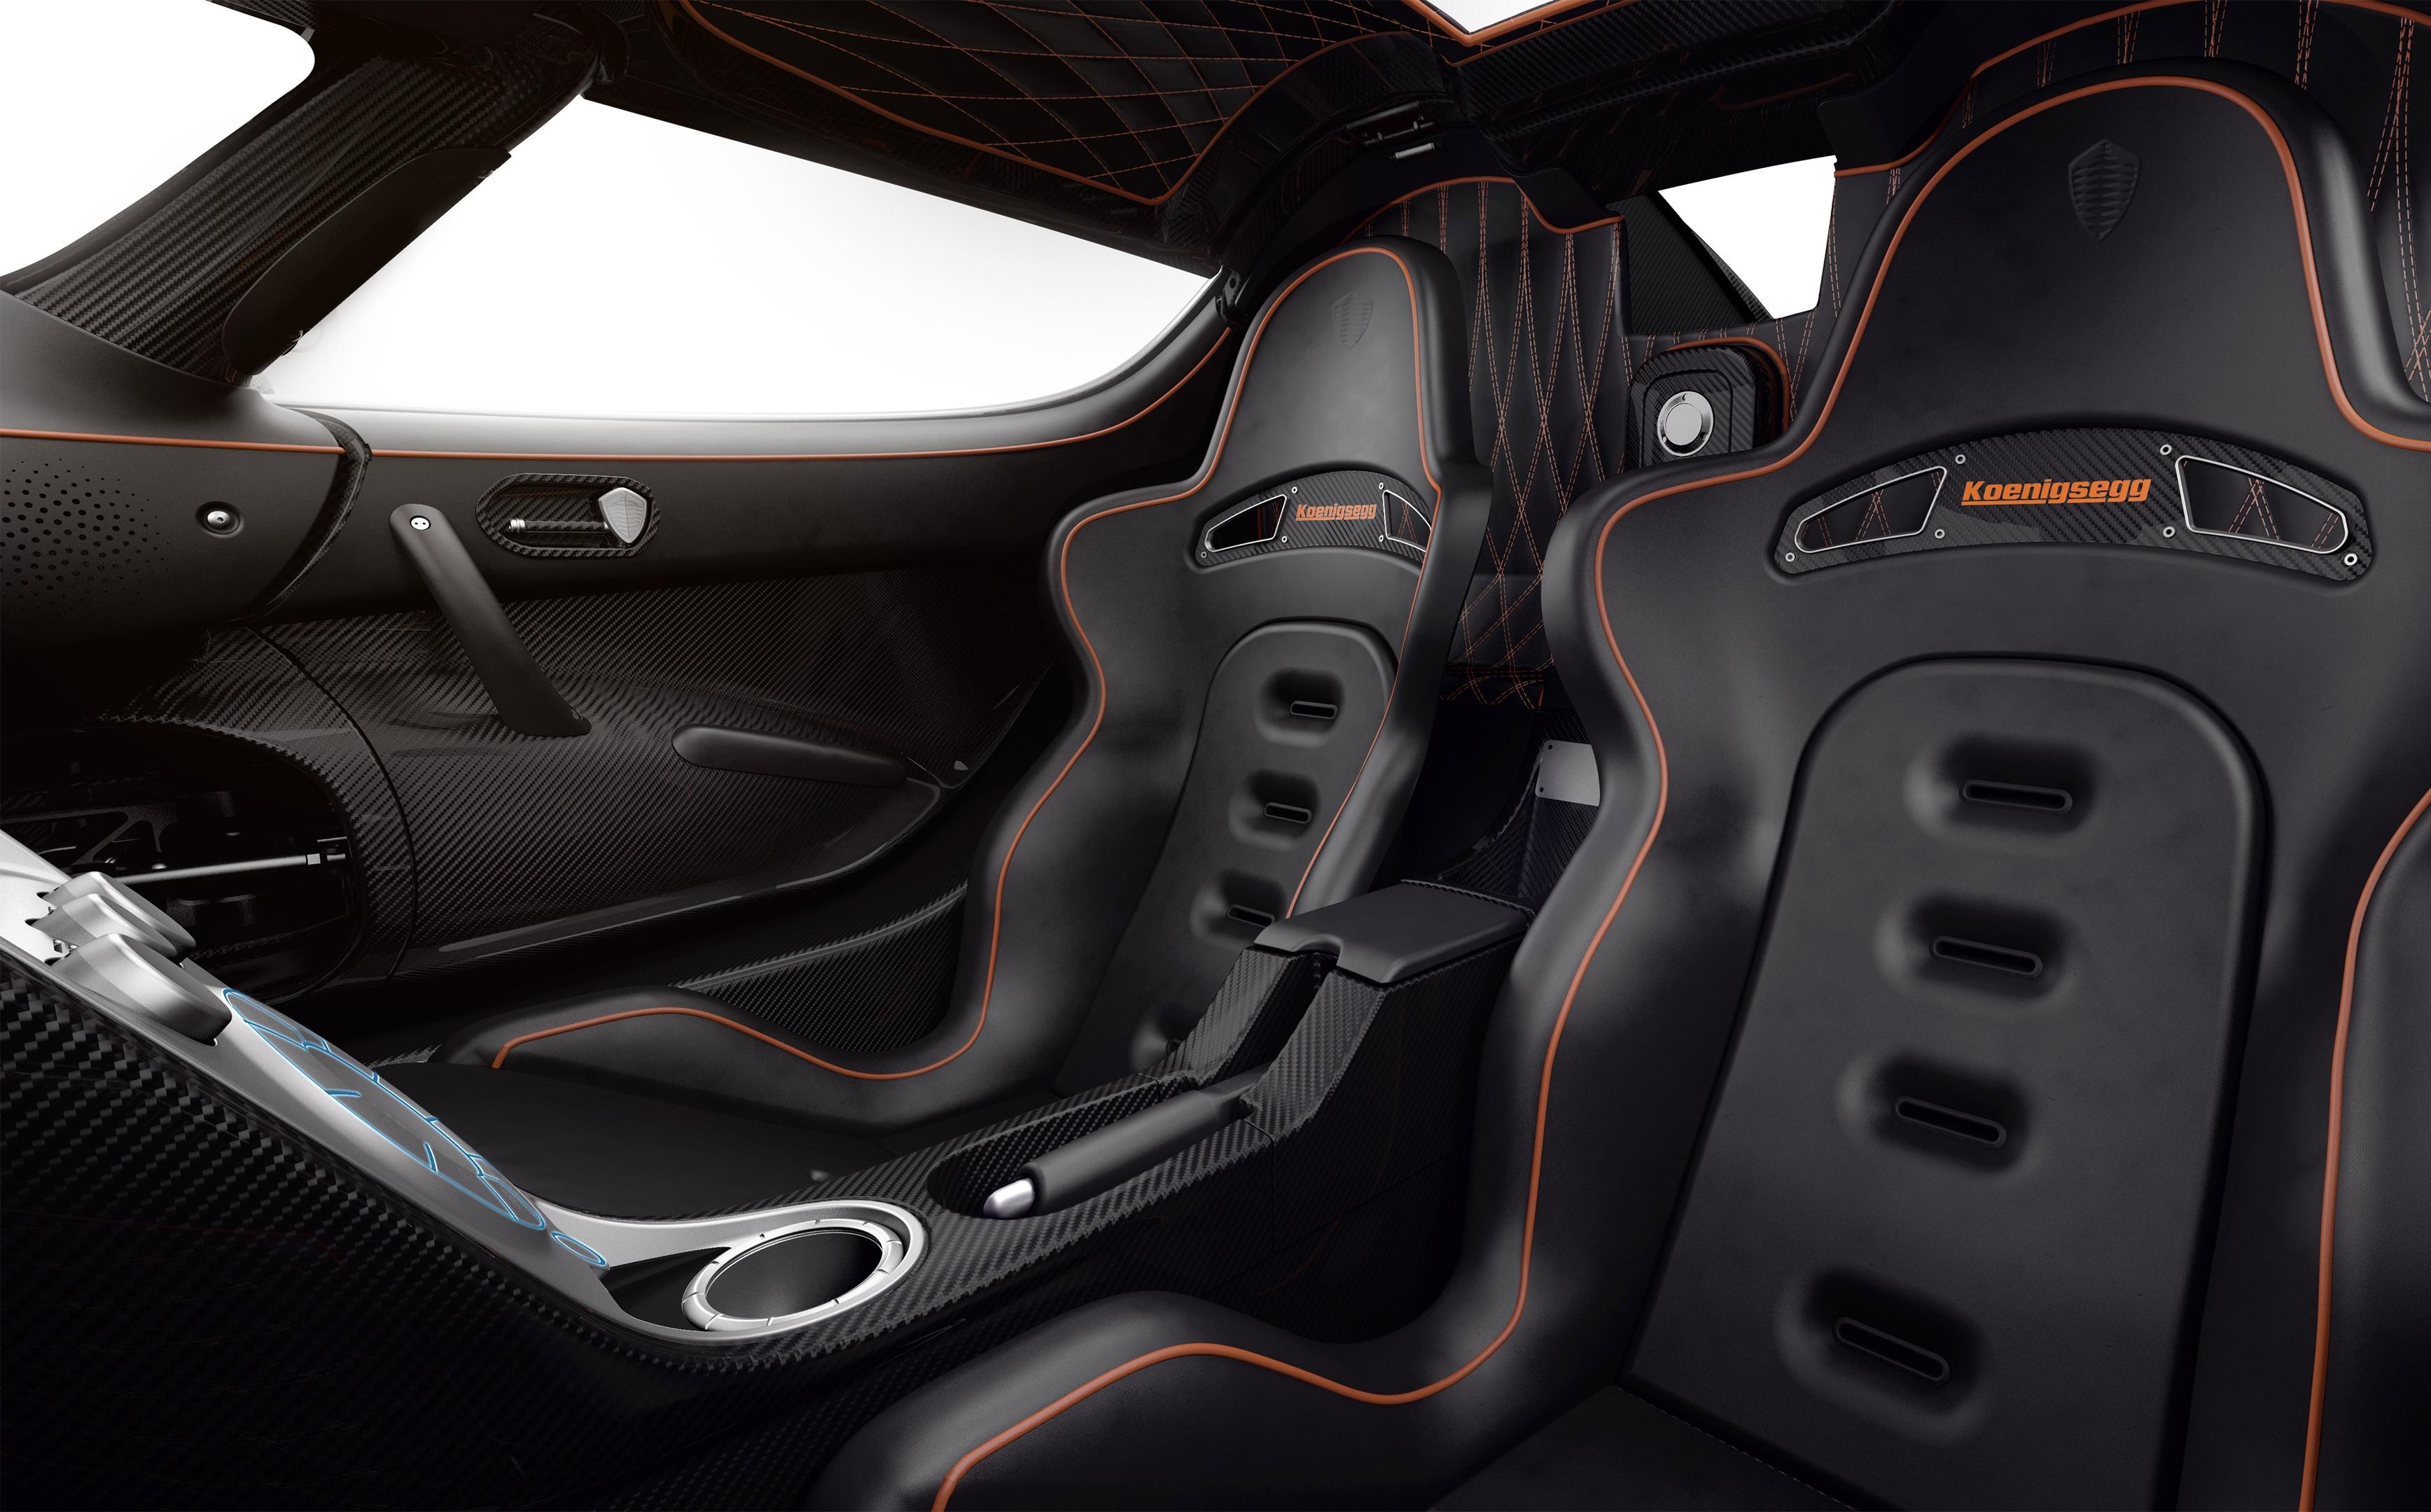 Koenigsegg_AgeraRS_interior_seat.jpg